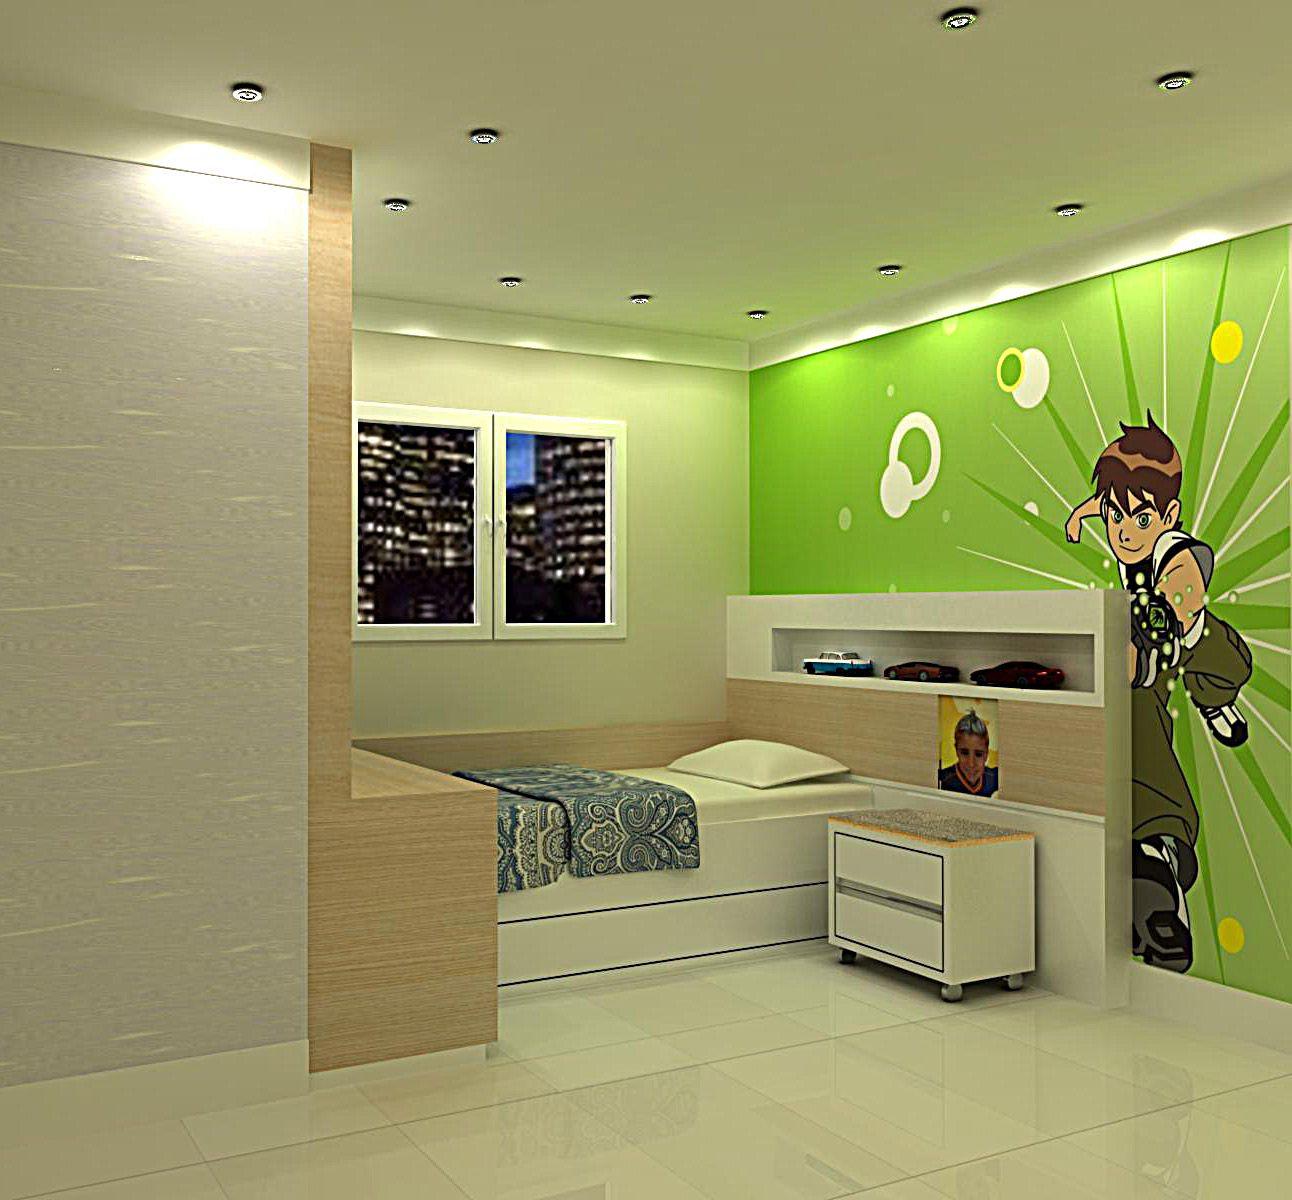 Decoracao de quarto de menino 1292 1200 quarto for Ben 10 bedroom ideas